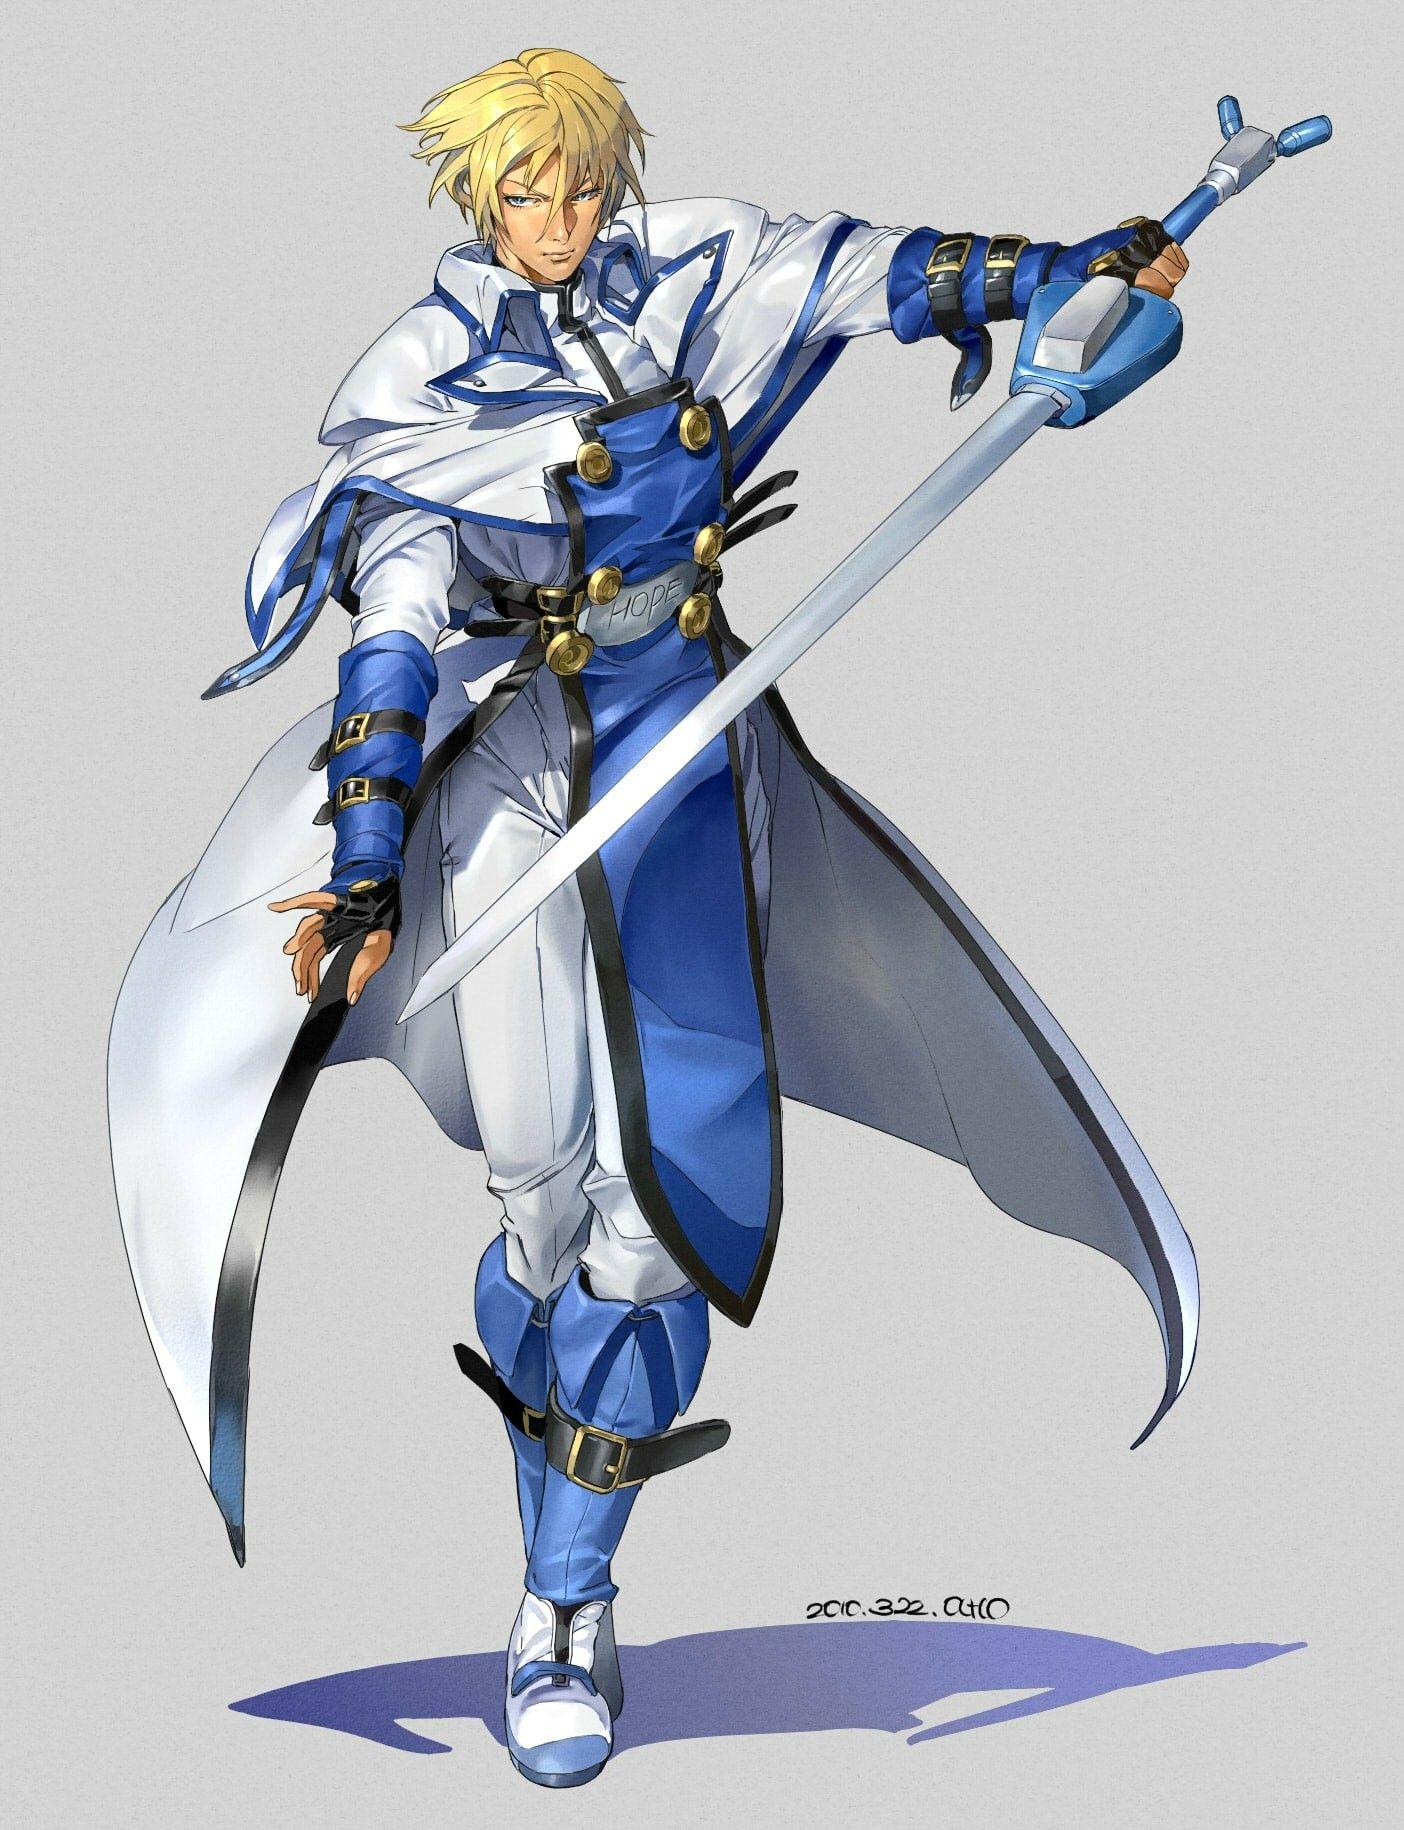 Pin by Mazus Kakazus on Fighting Game Anime guys